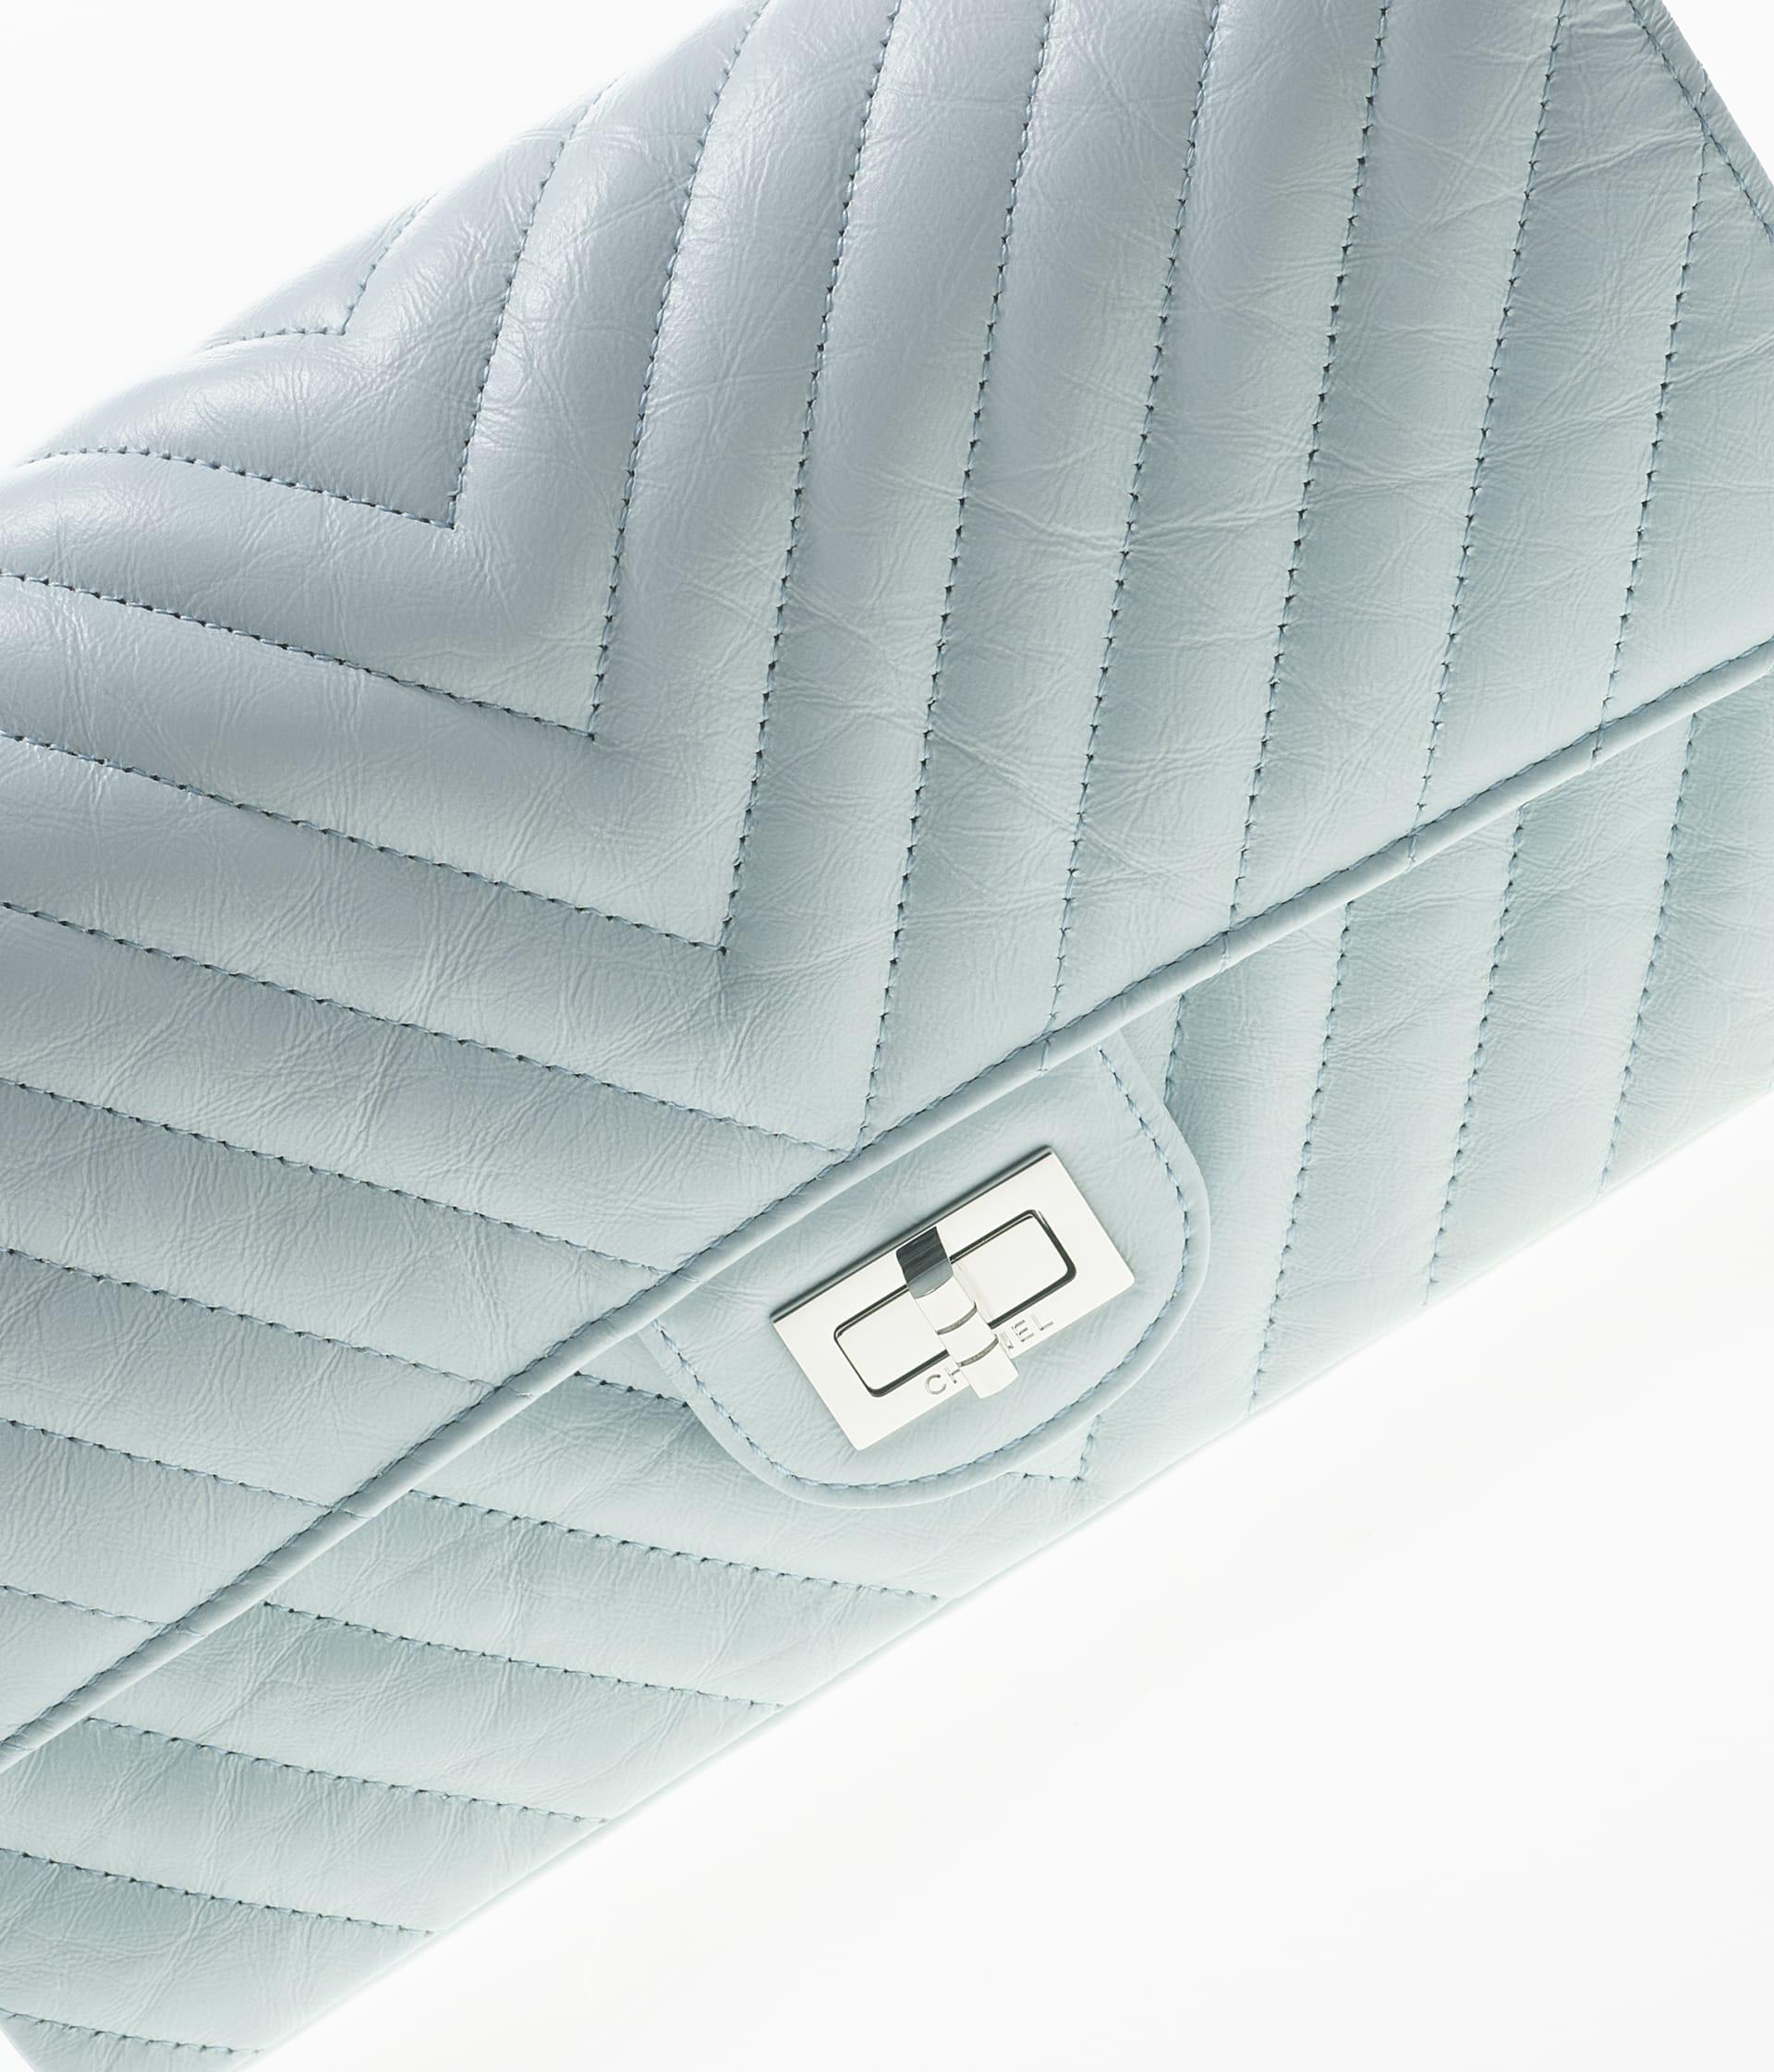 image 4 - 2.55 Handbag - Aged Calfskin & Silver-Tone Metal - Light Blue